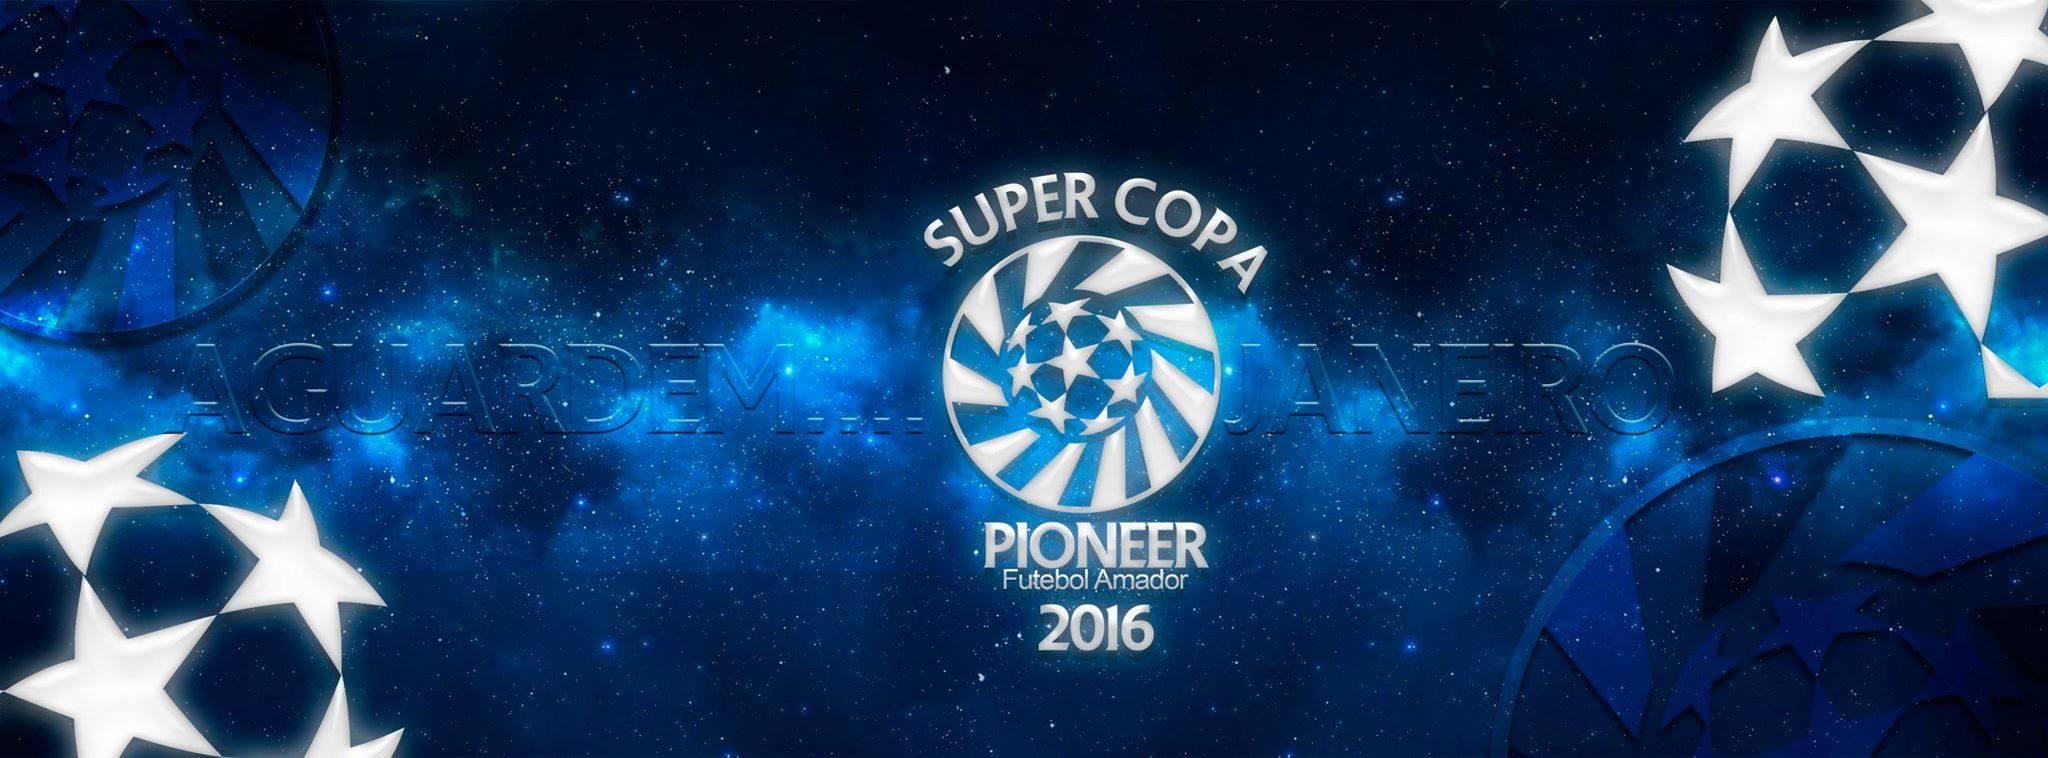 Detalhes da Super Copa Pioneer 2016